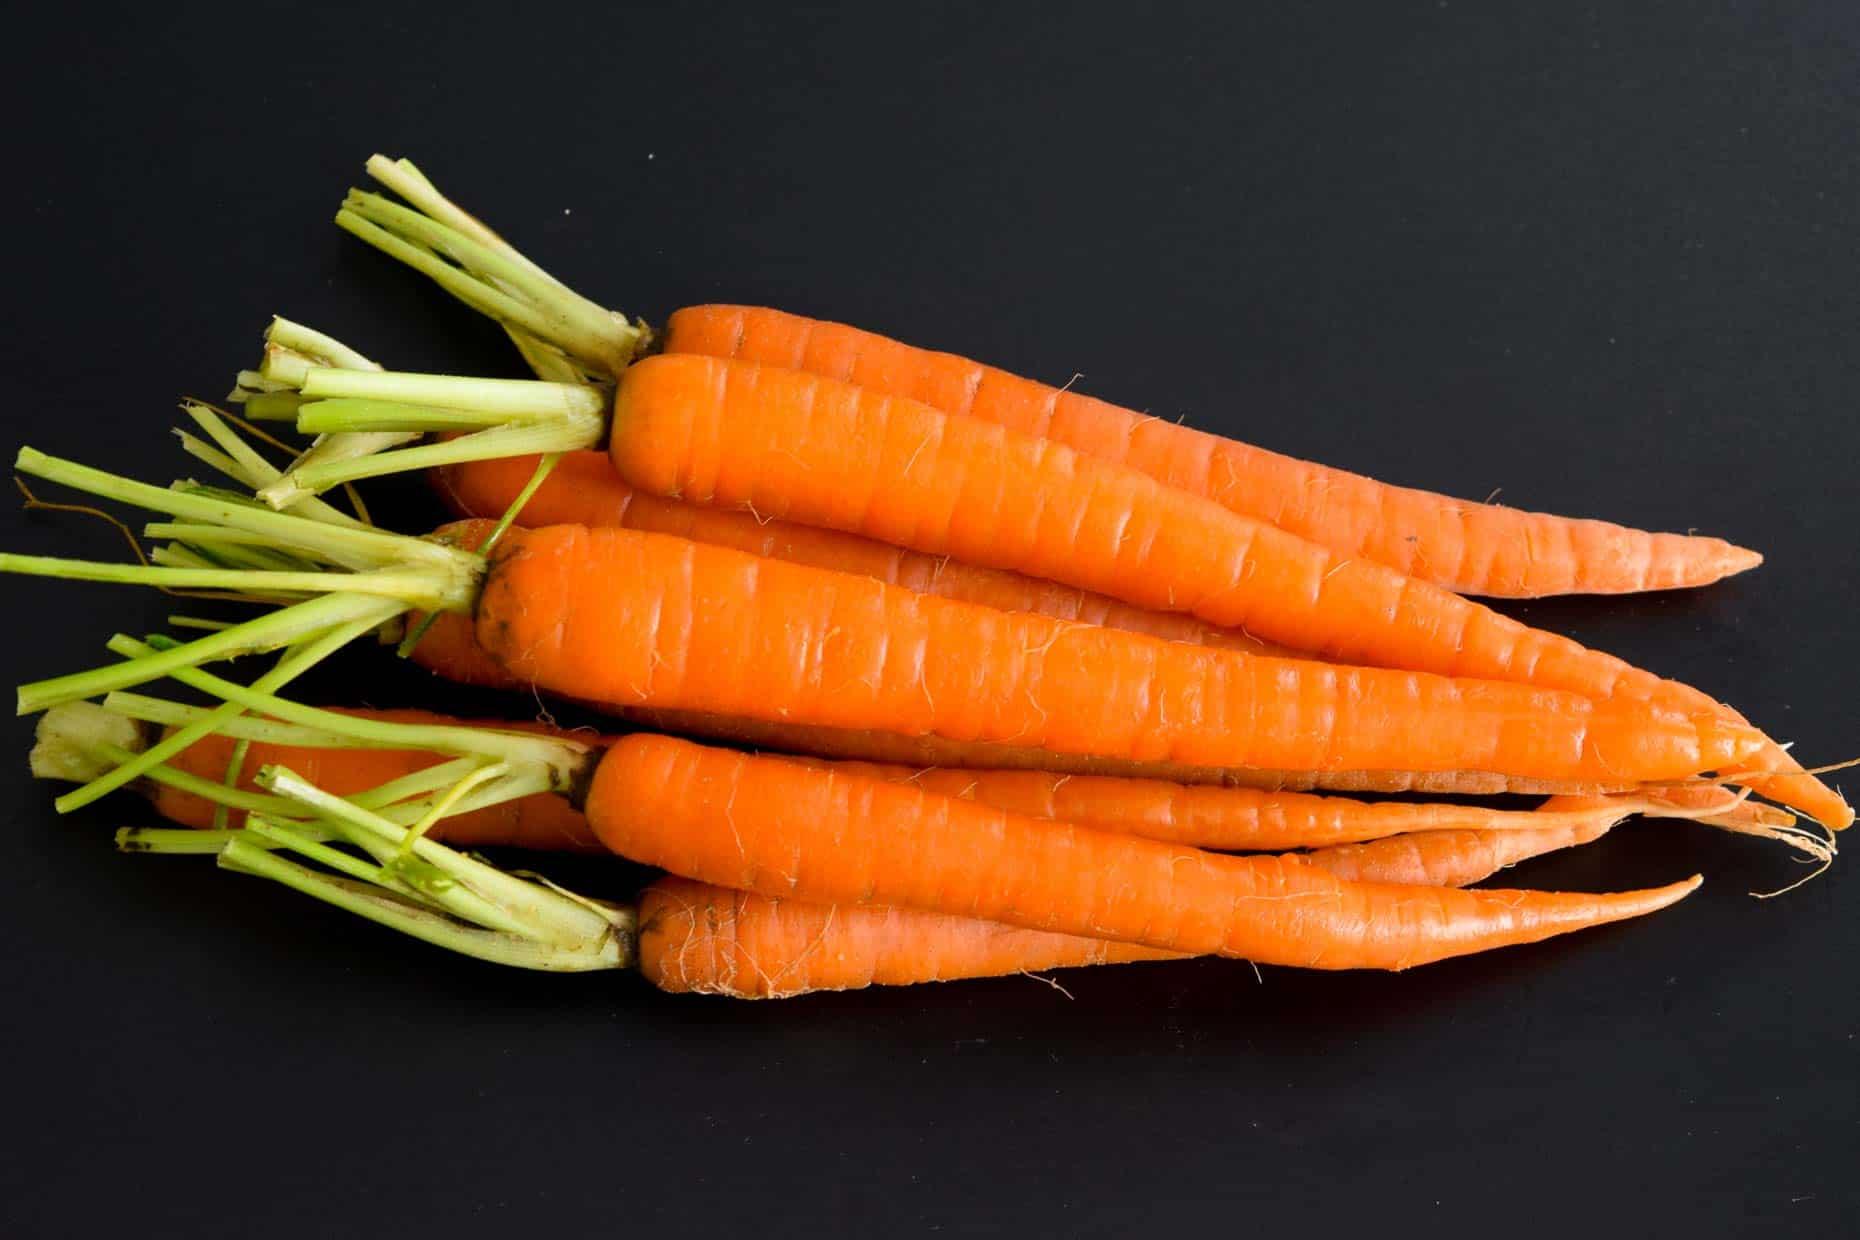 Carrots on black background